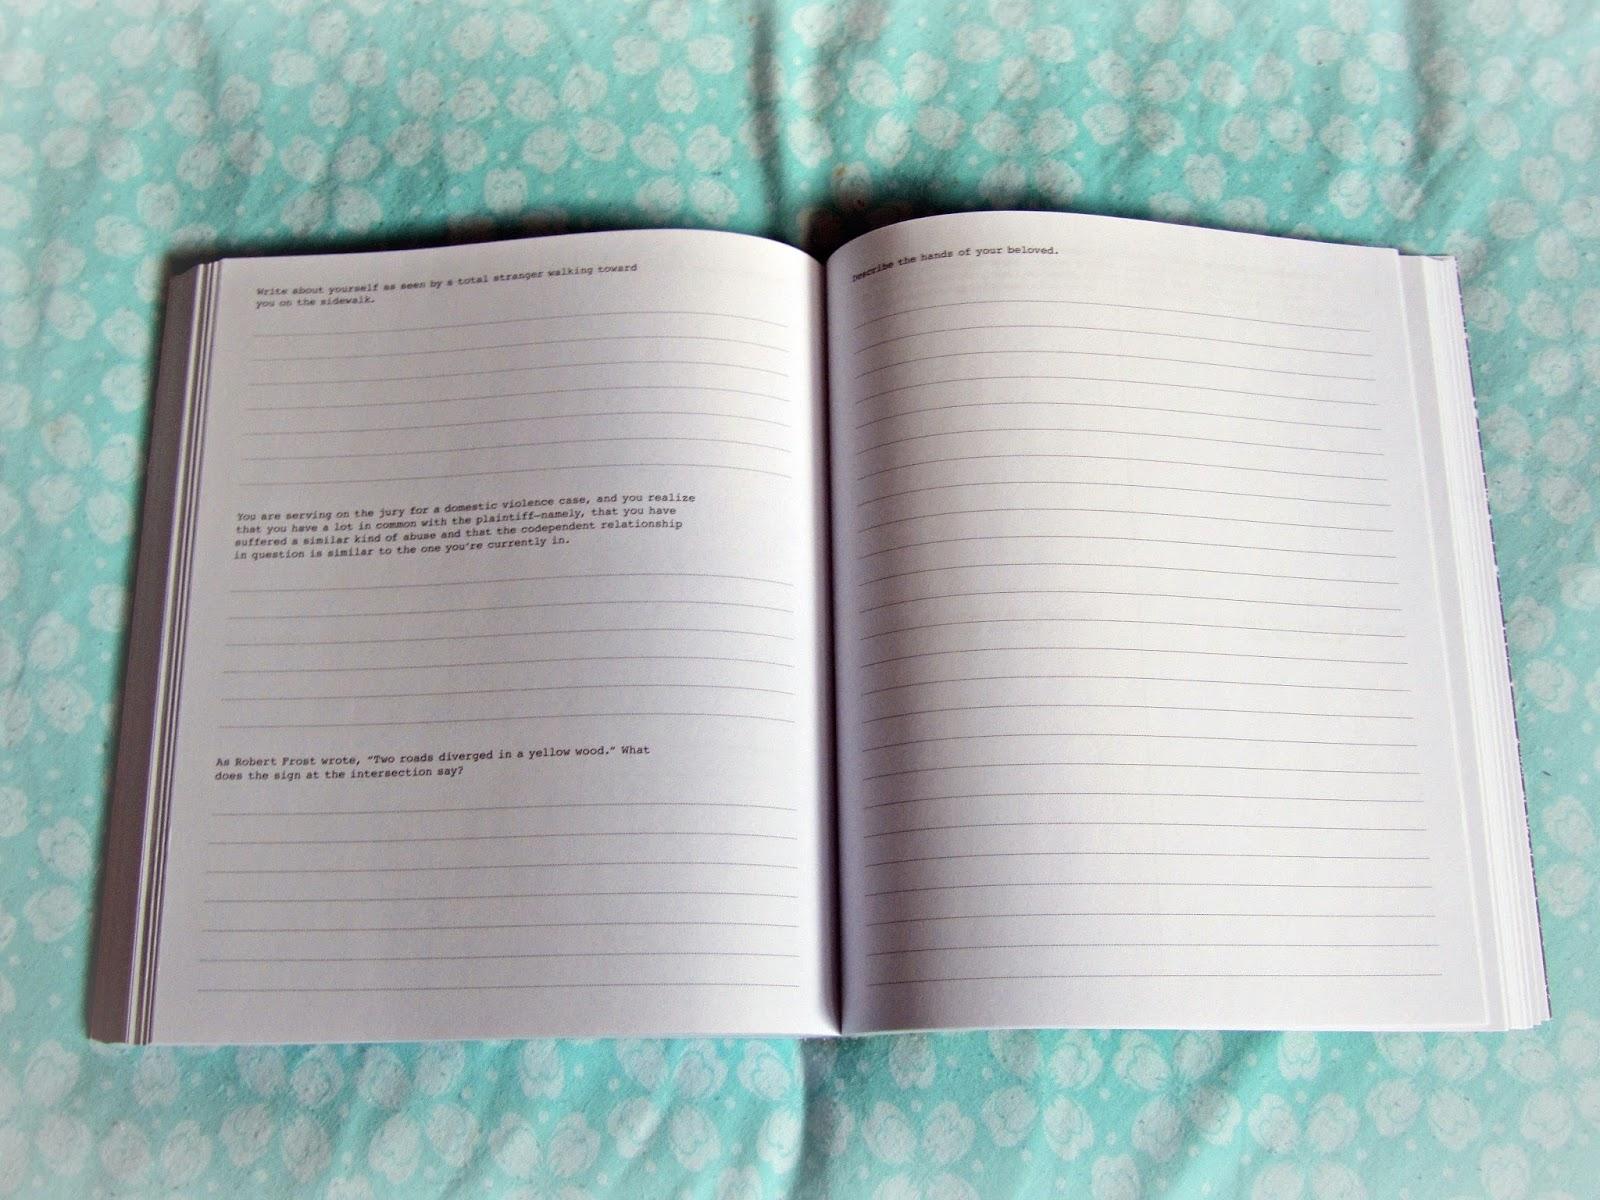 Basic essay outline quick